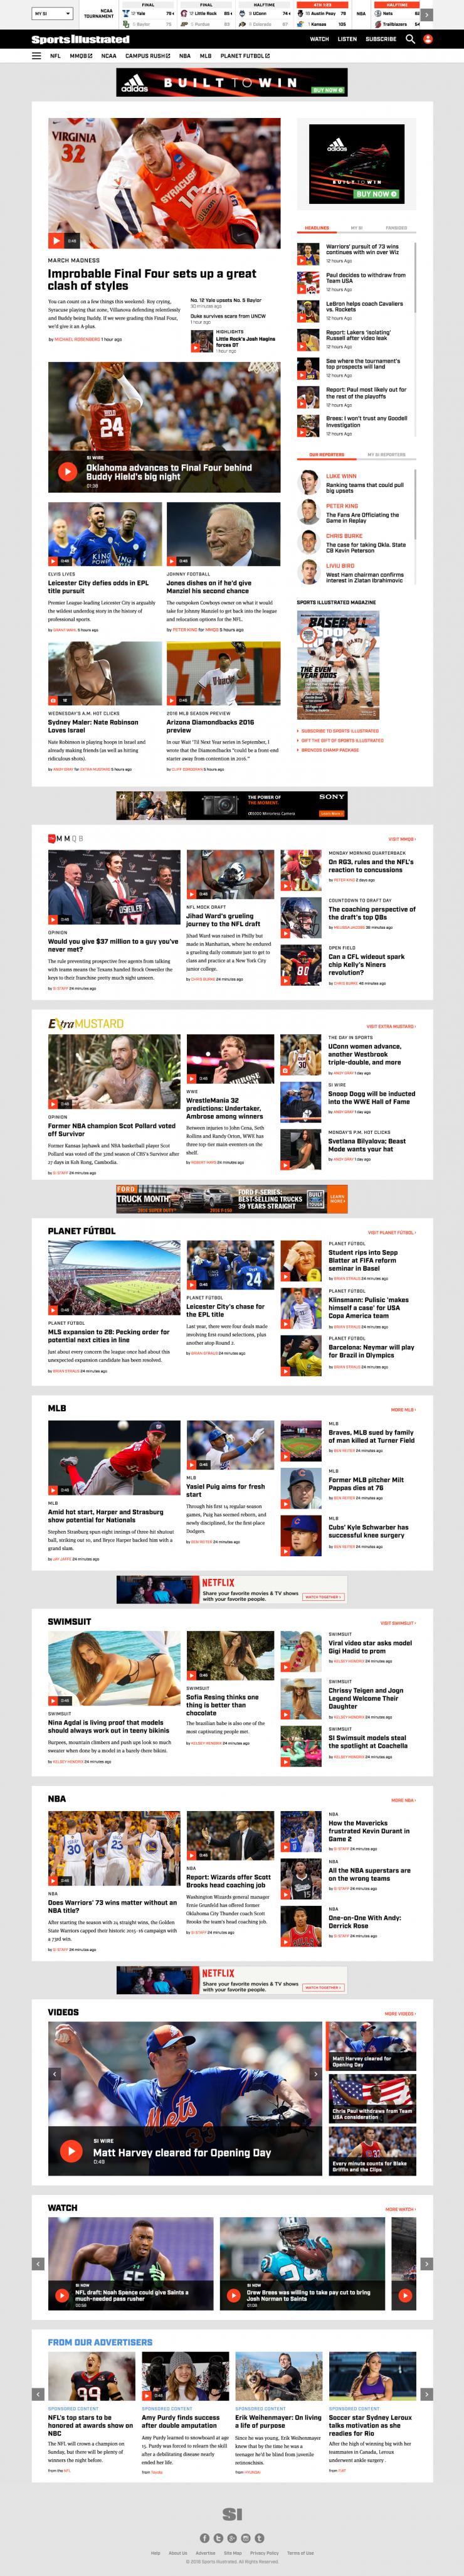 Sports Illustrated 2016 Redesign – Desktop